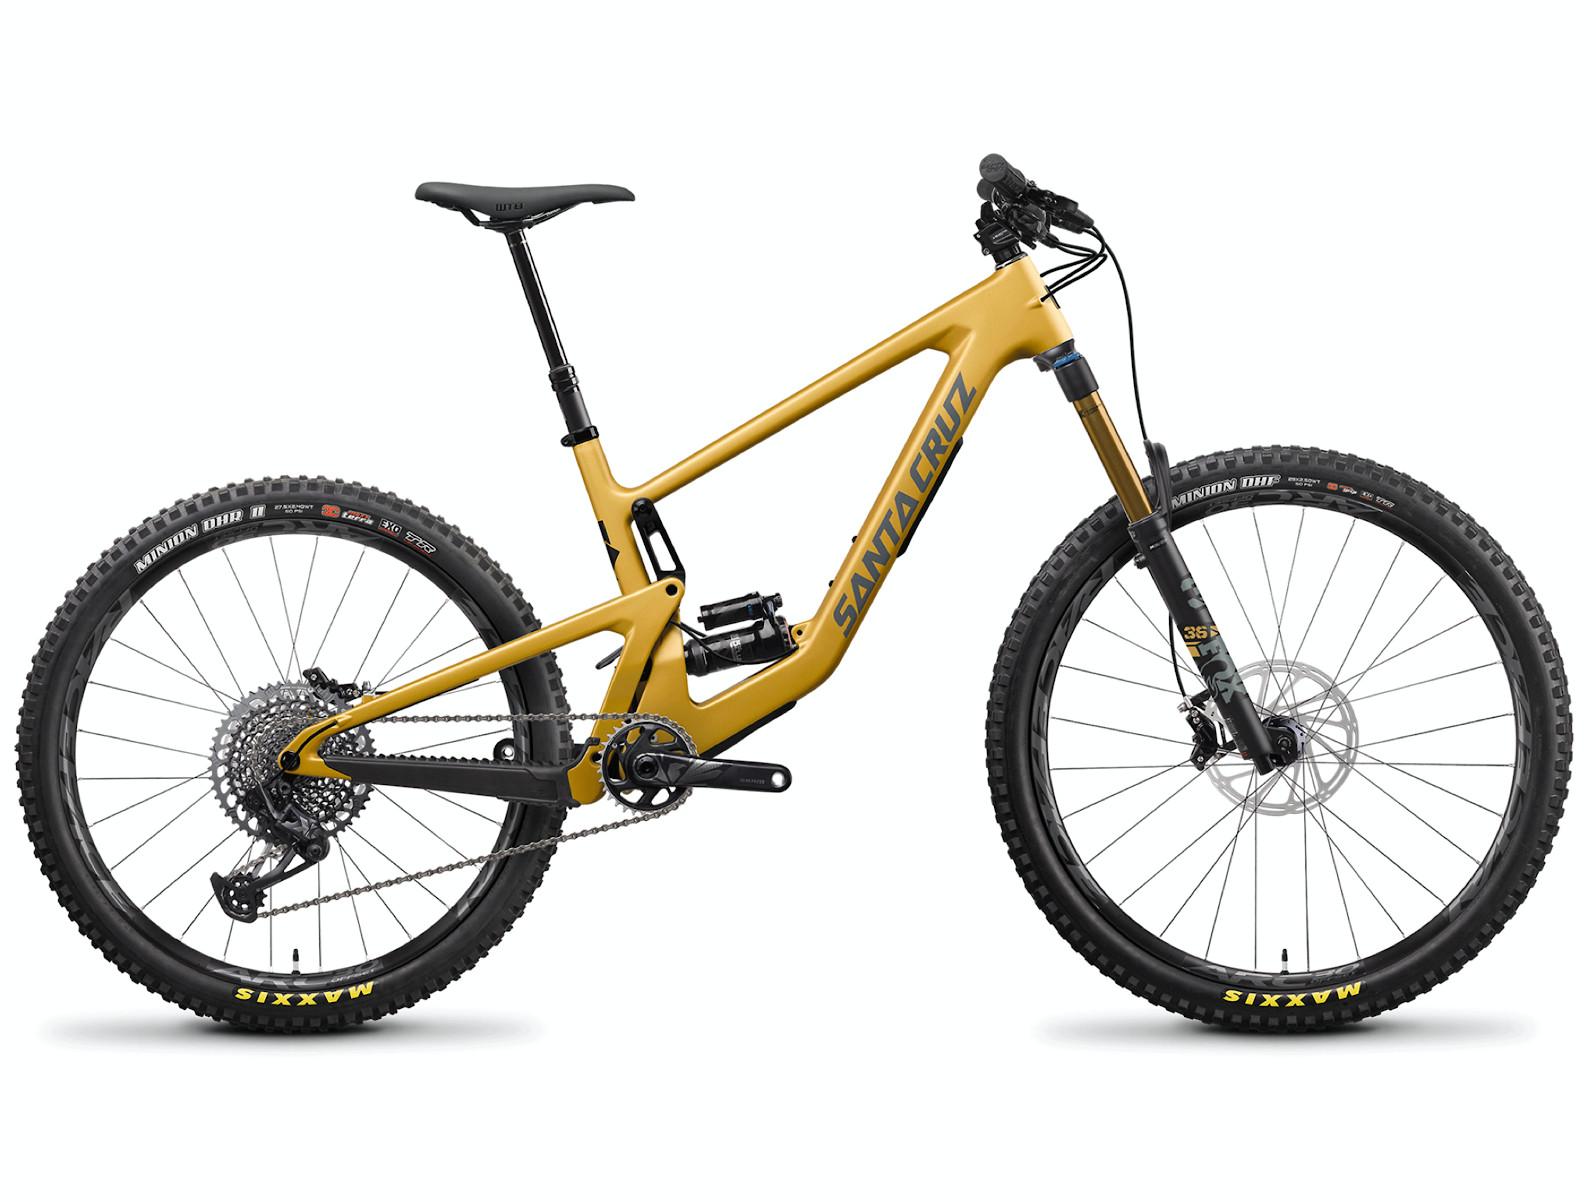 2022 Santa Cruz Bronson MX Carbon CC X01 Bike (Paydirt Gold and Grey)